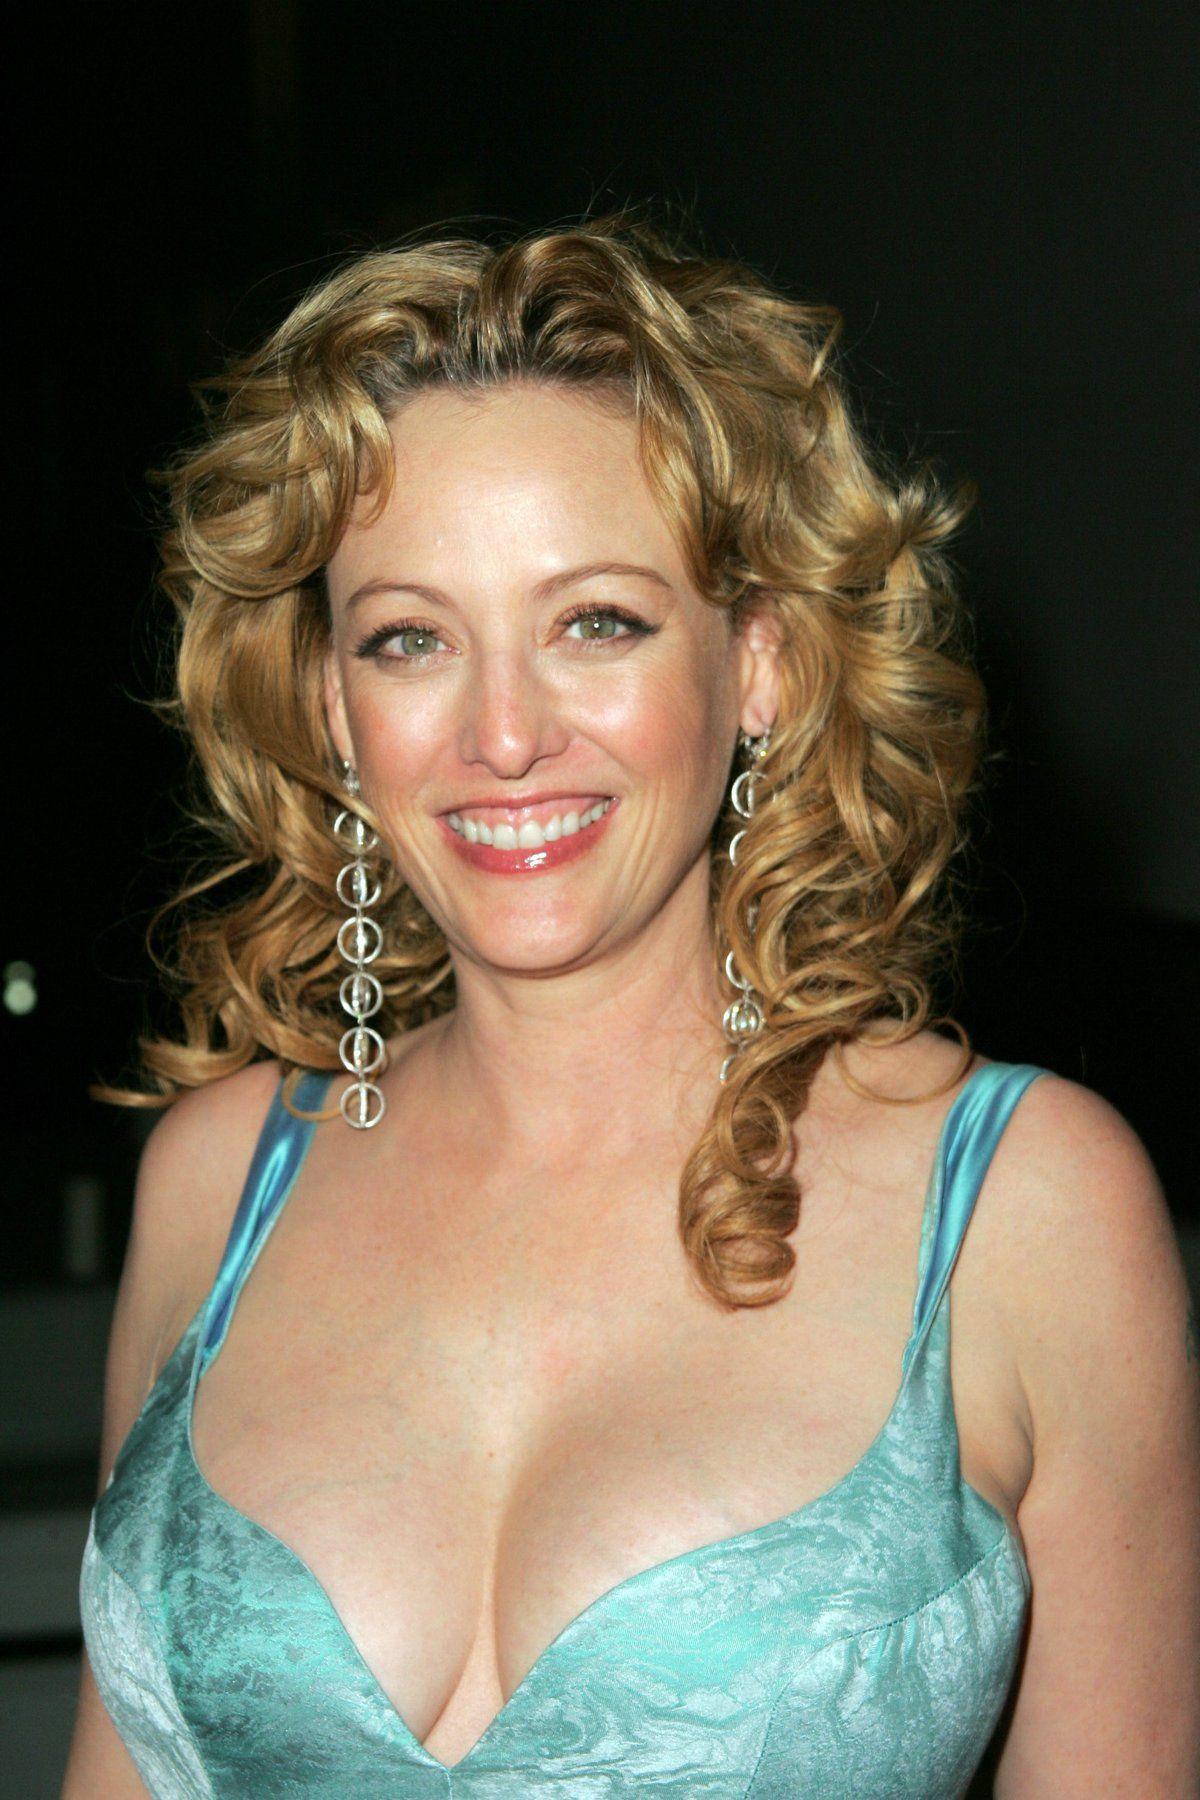 Sandy Johnson,Jill Eikenberry born January 21, 1947 (age 71) Hot pic Claire Goose (born 1975),Judith Ridley